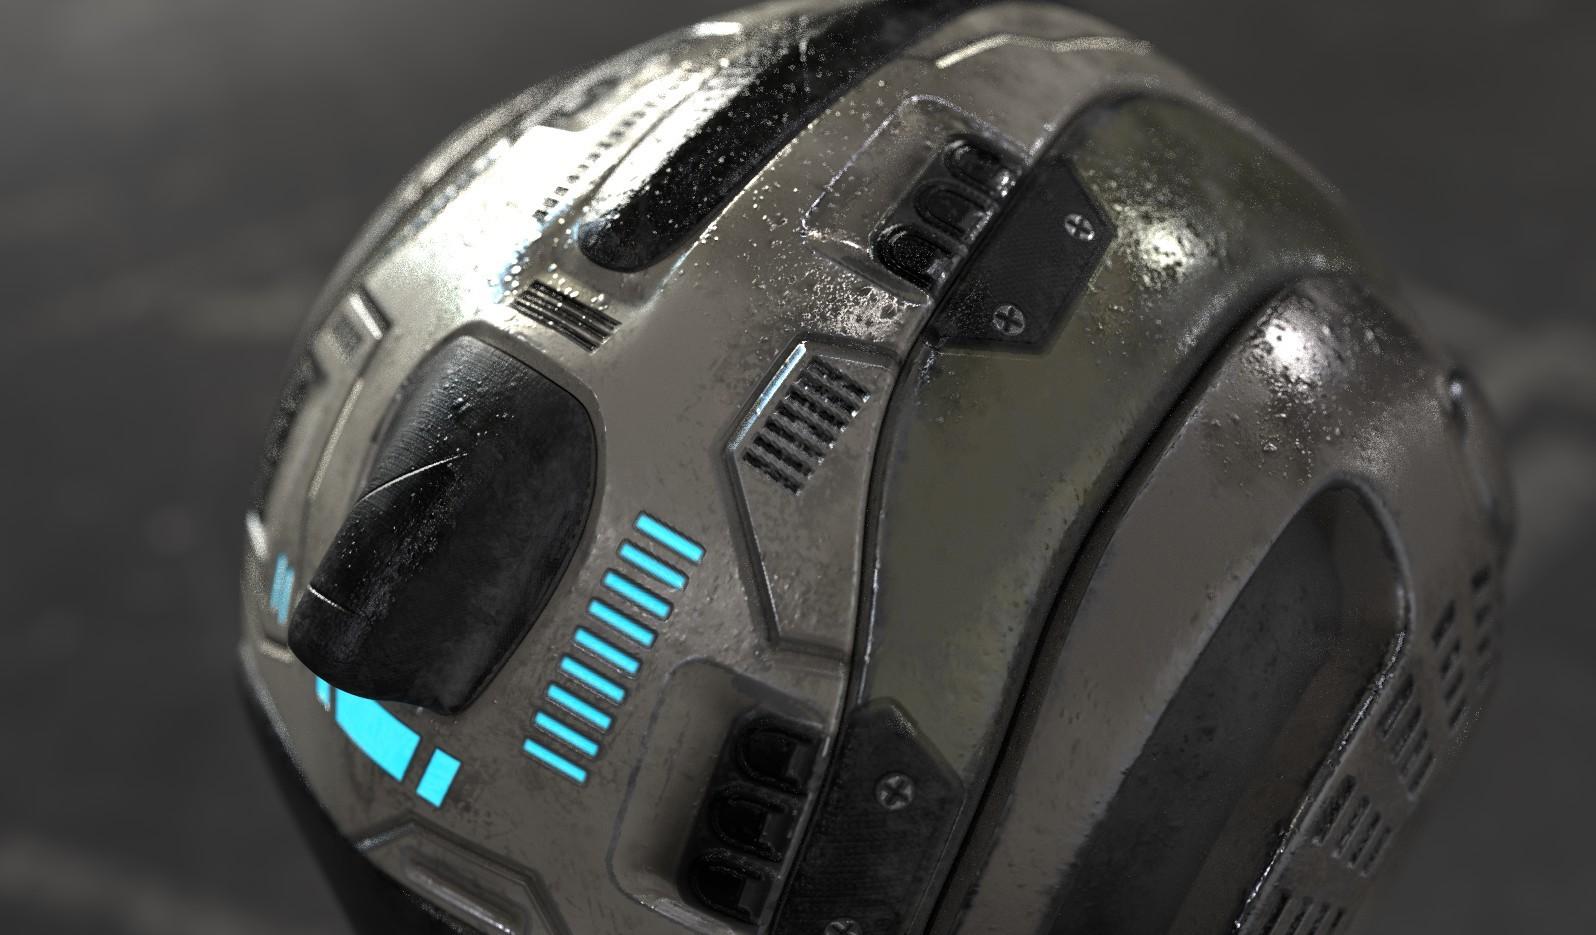 Cem tezcan robo wip 17